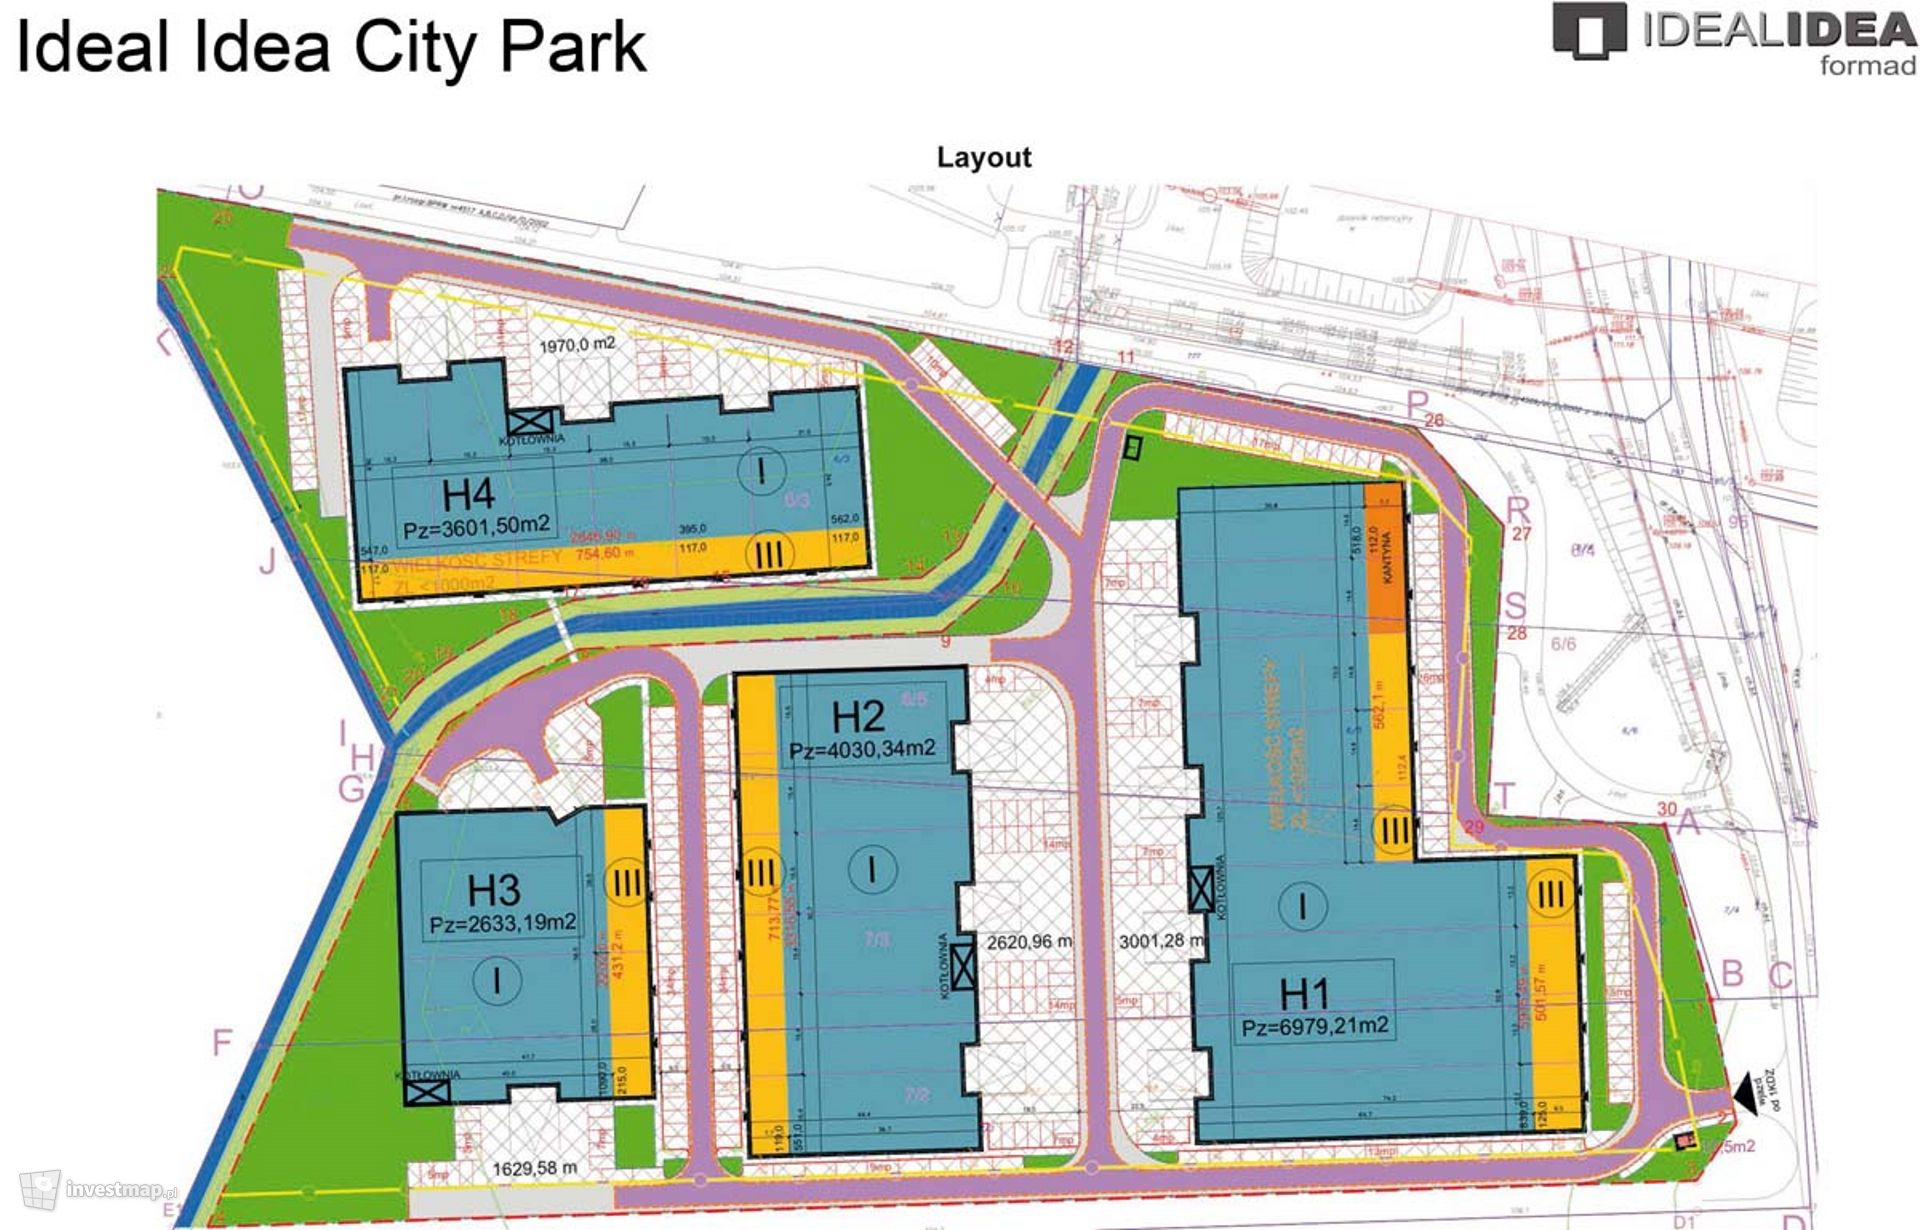 Ideal Idea City Park